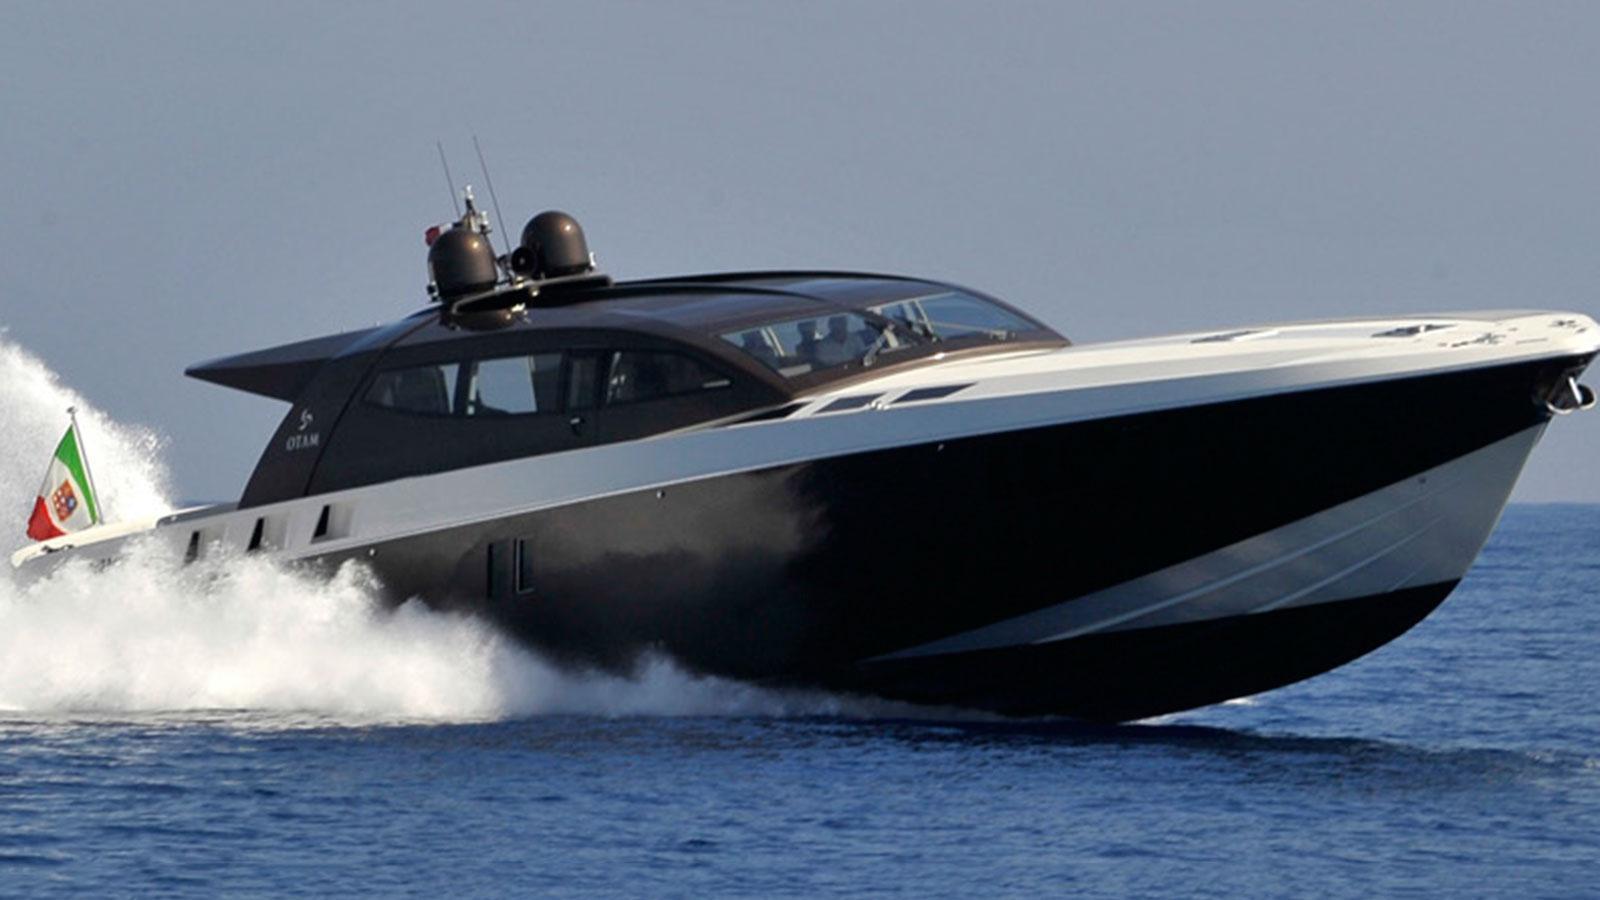 The superyacht Black Bullet by Otam